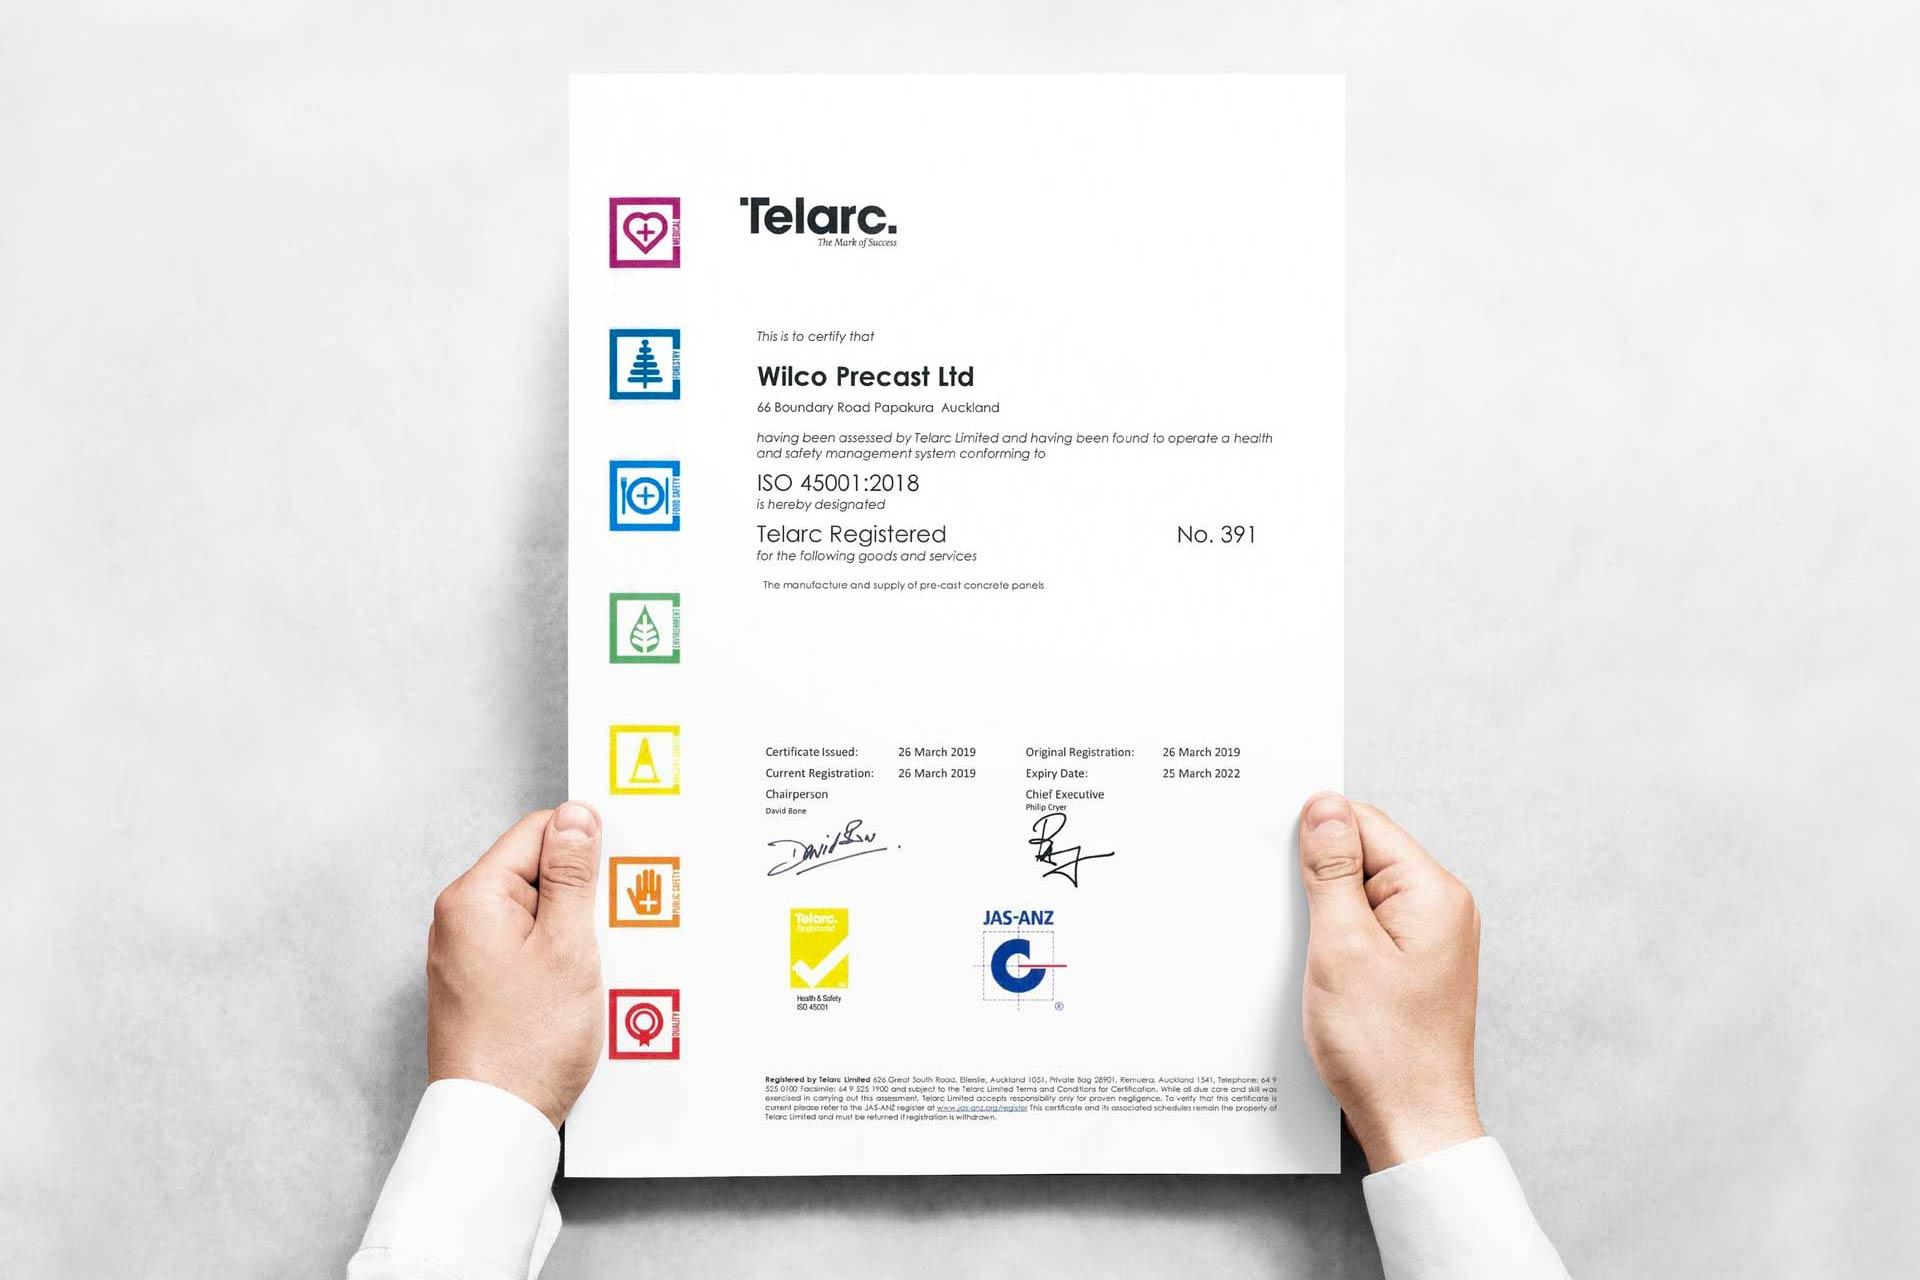 telarc-featured-image-1